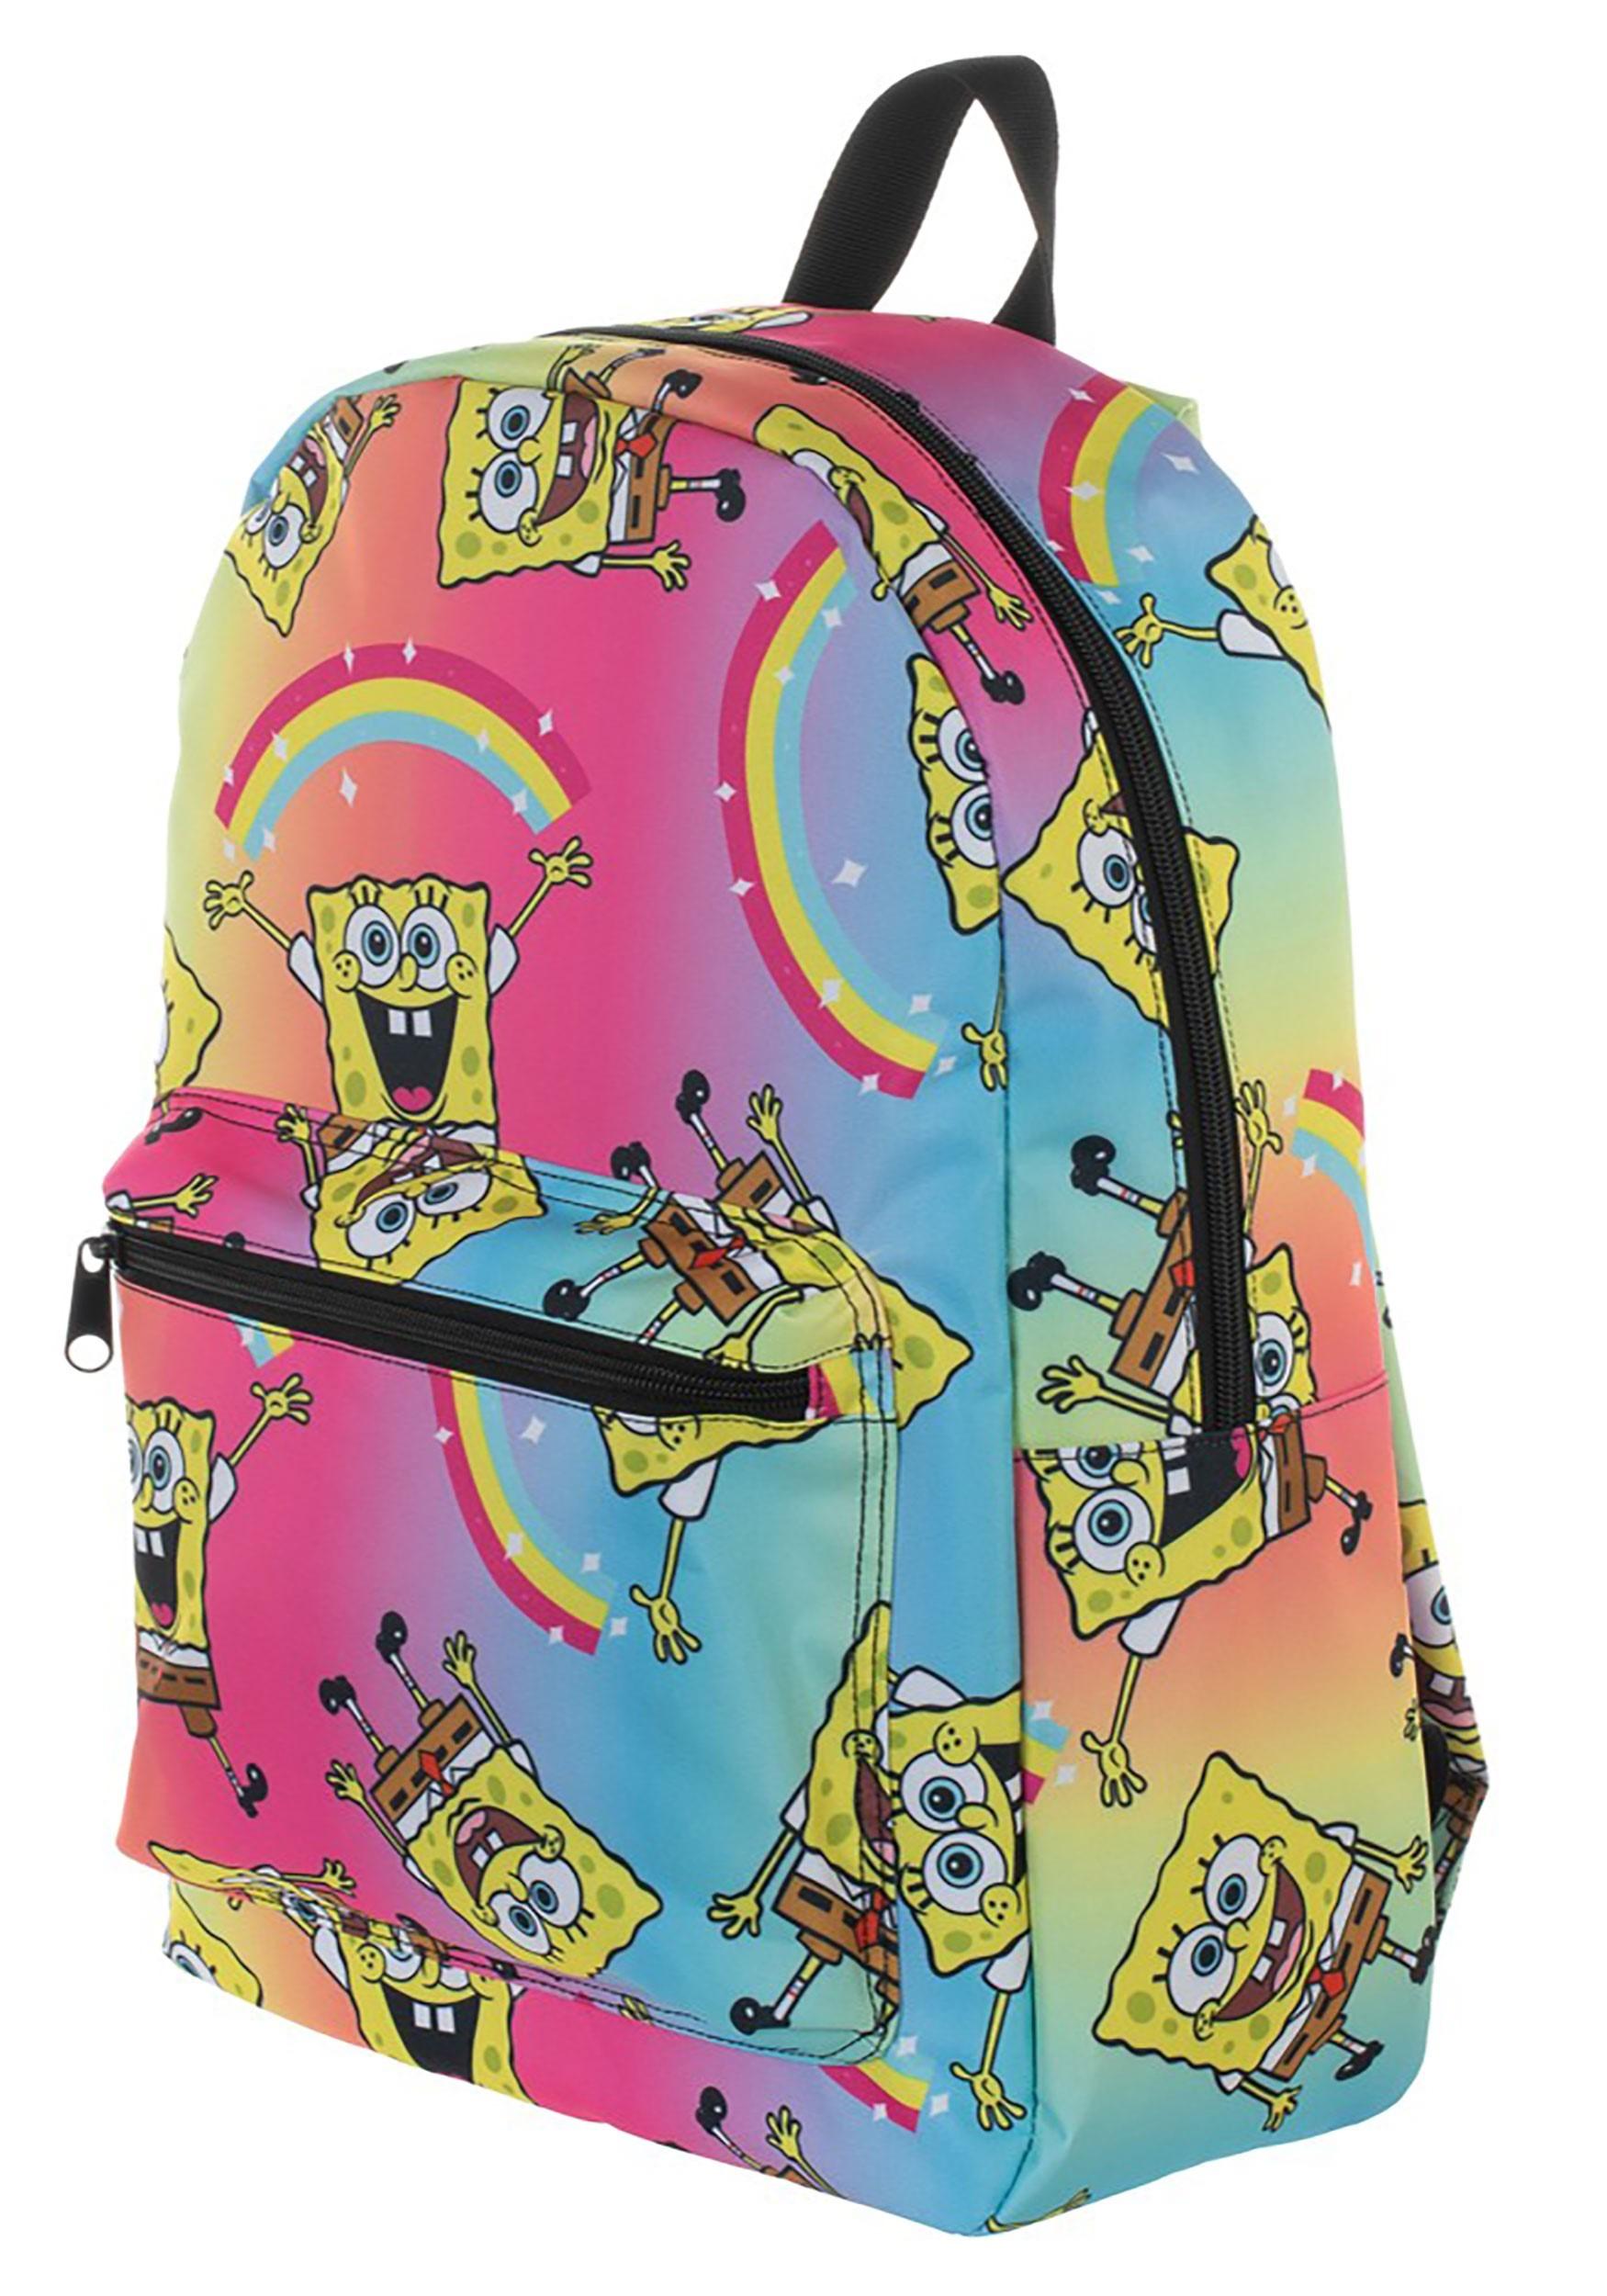 Spongebob Squarepants Rainbow Print Backpack